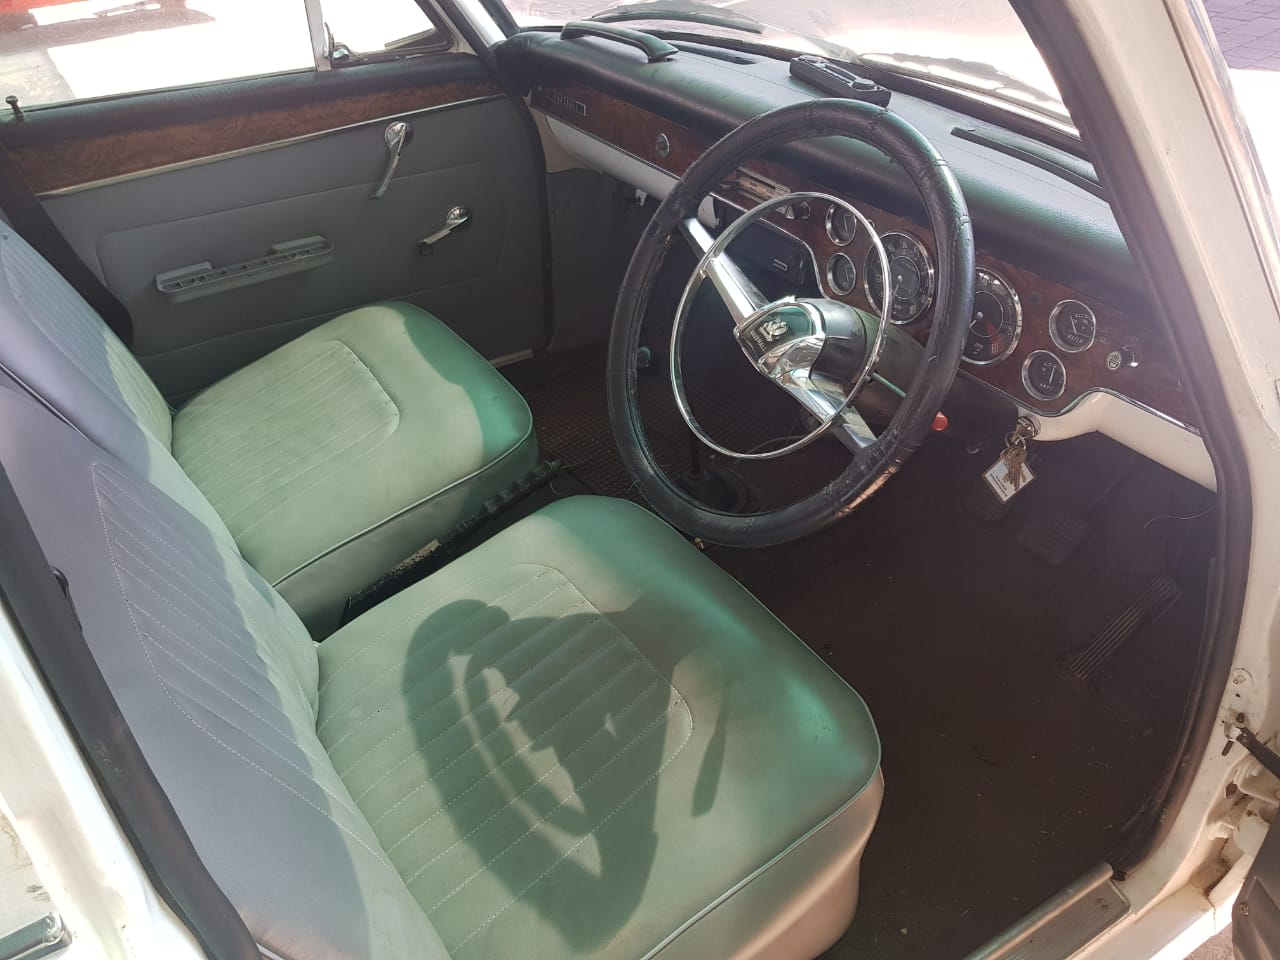 1964 Vauxhall VX 490 for sale, or Swop for a bakkie